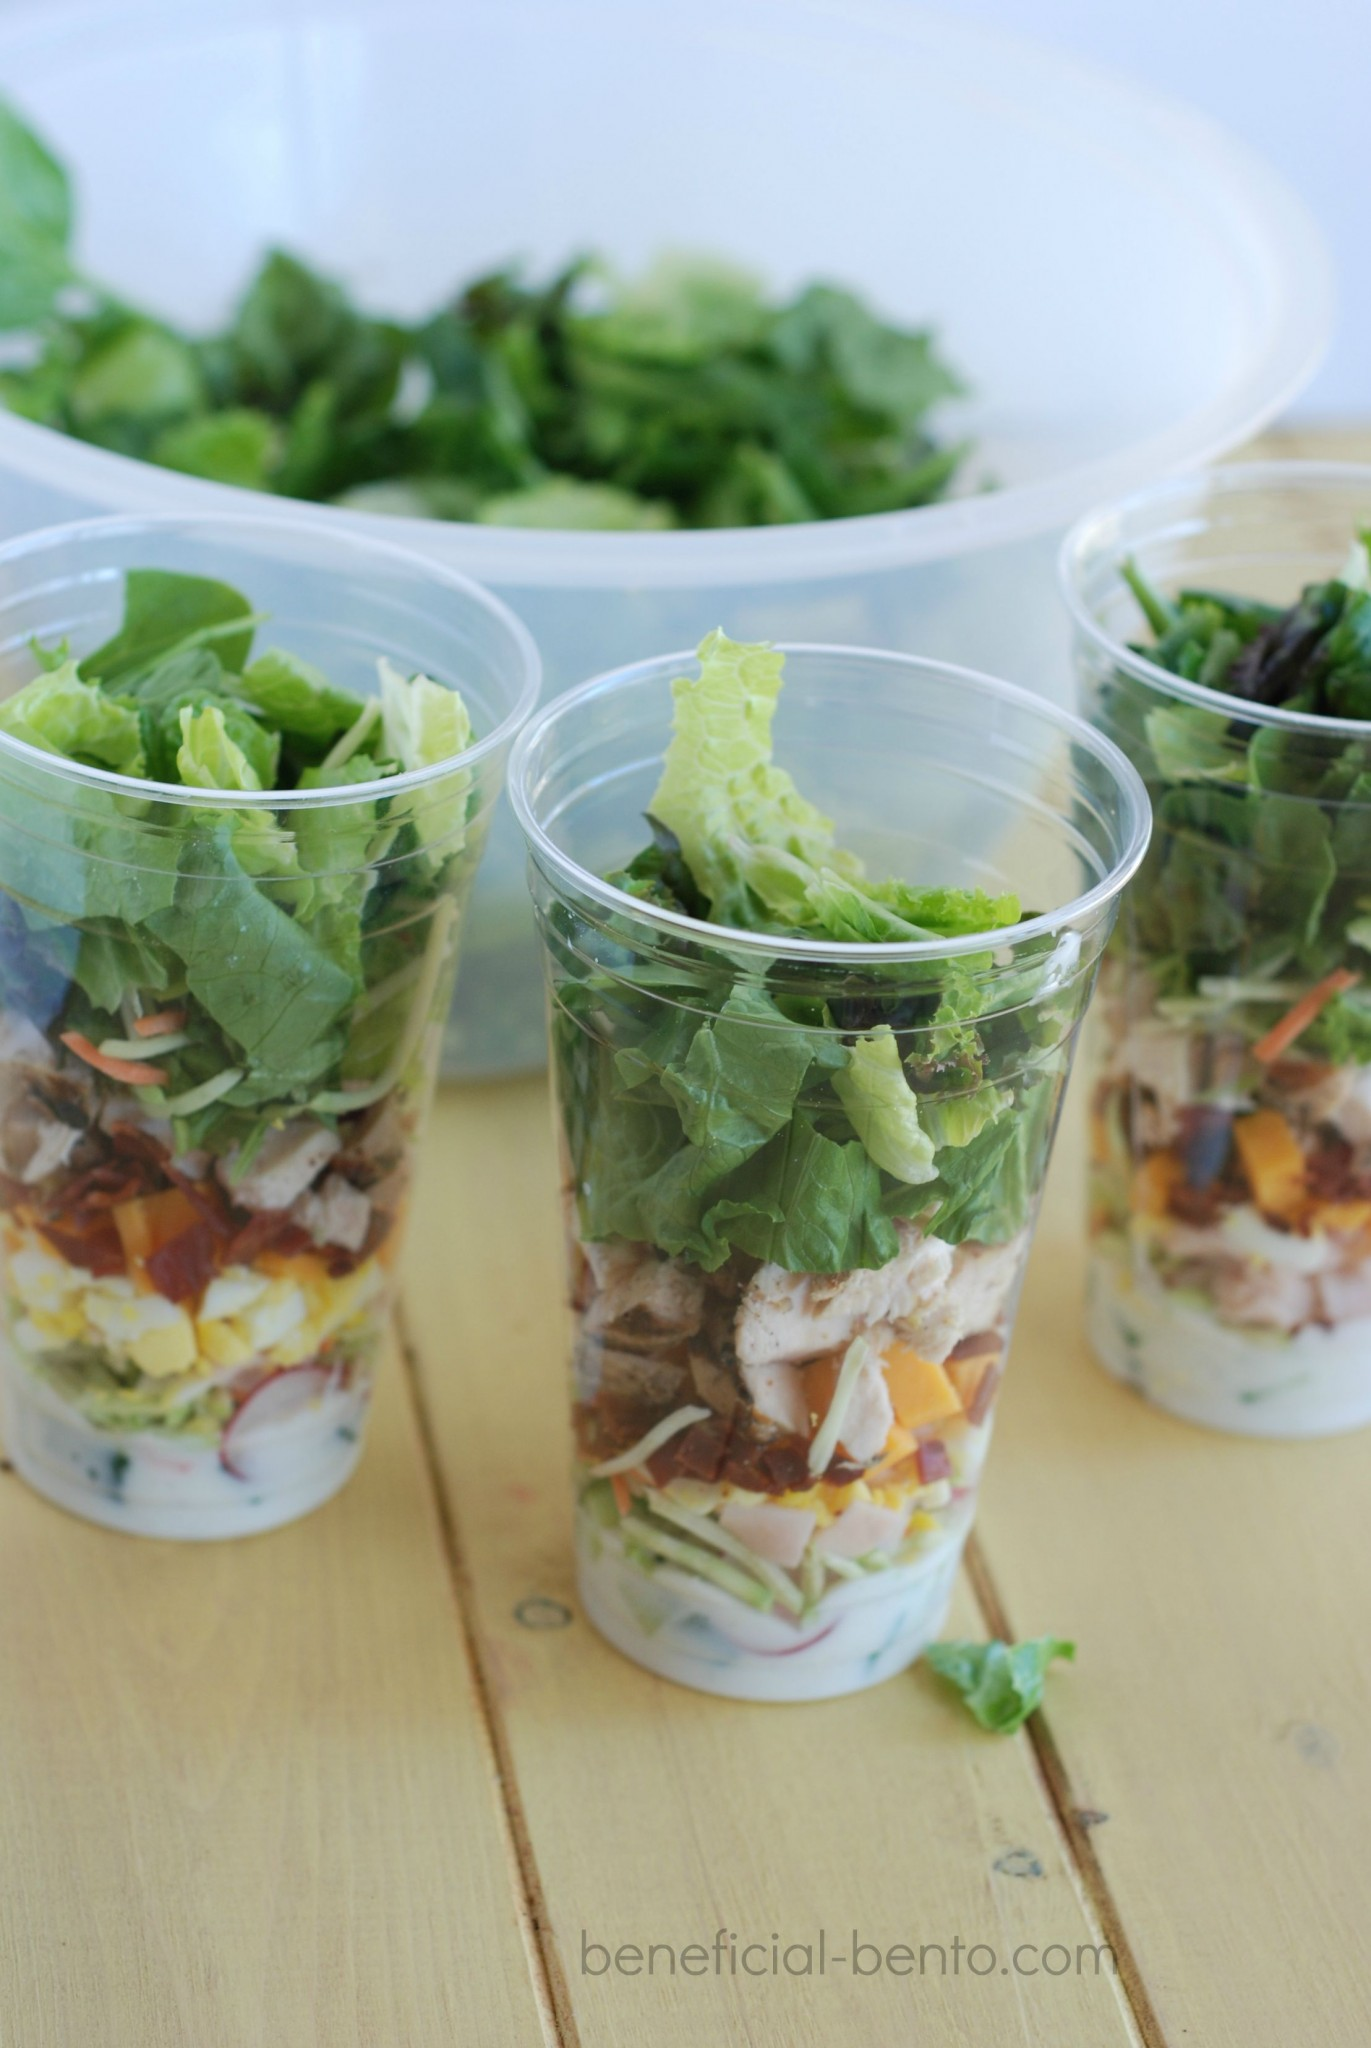 Salad Cups The Lightweight Easy Portable Mason Jar Salad